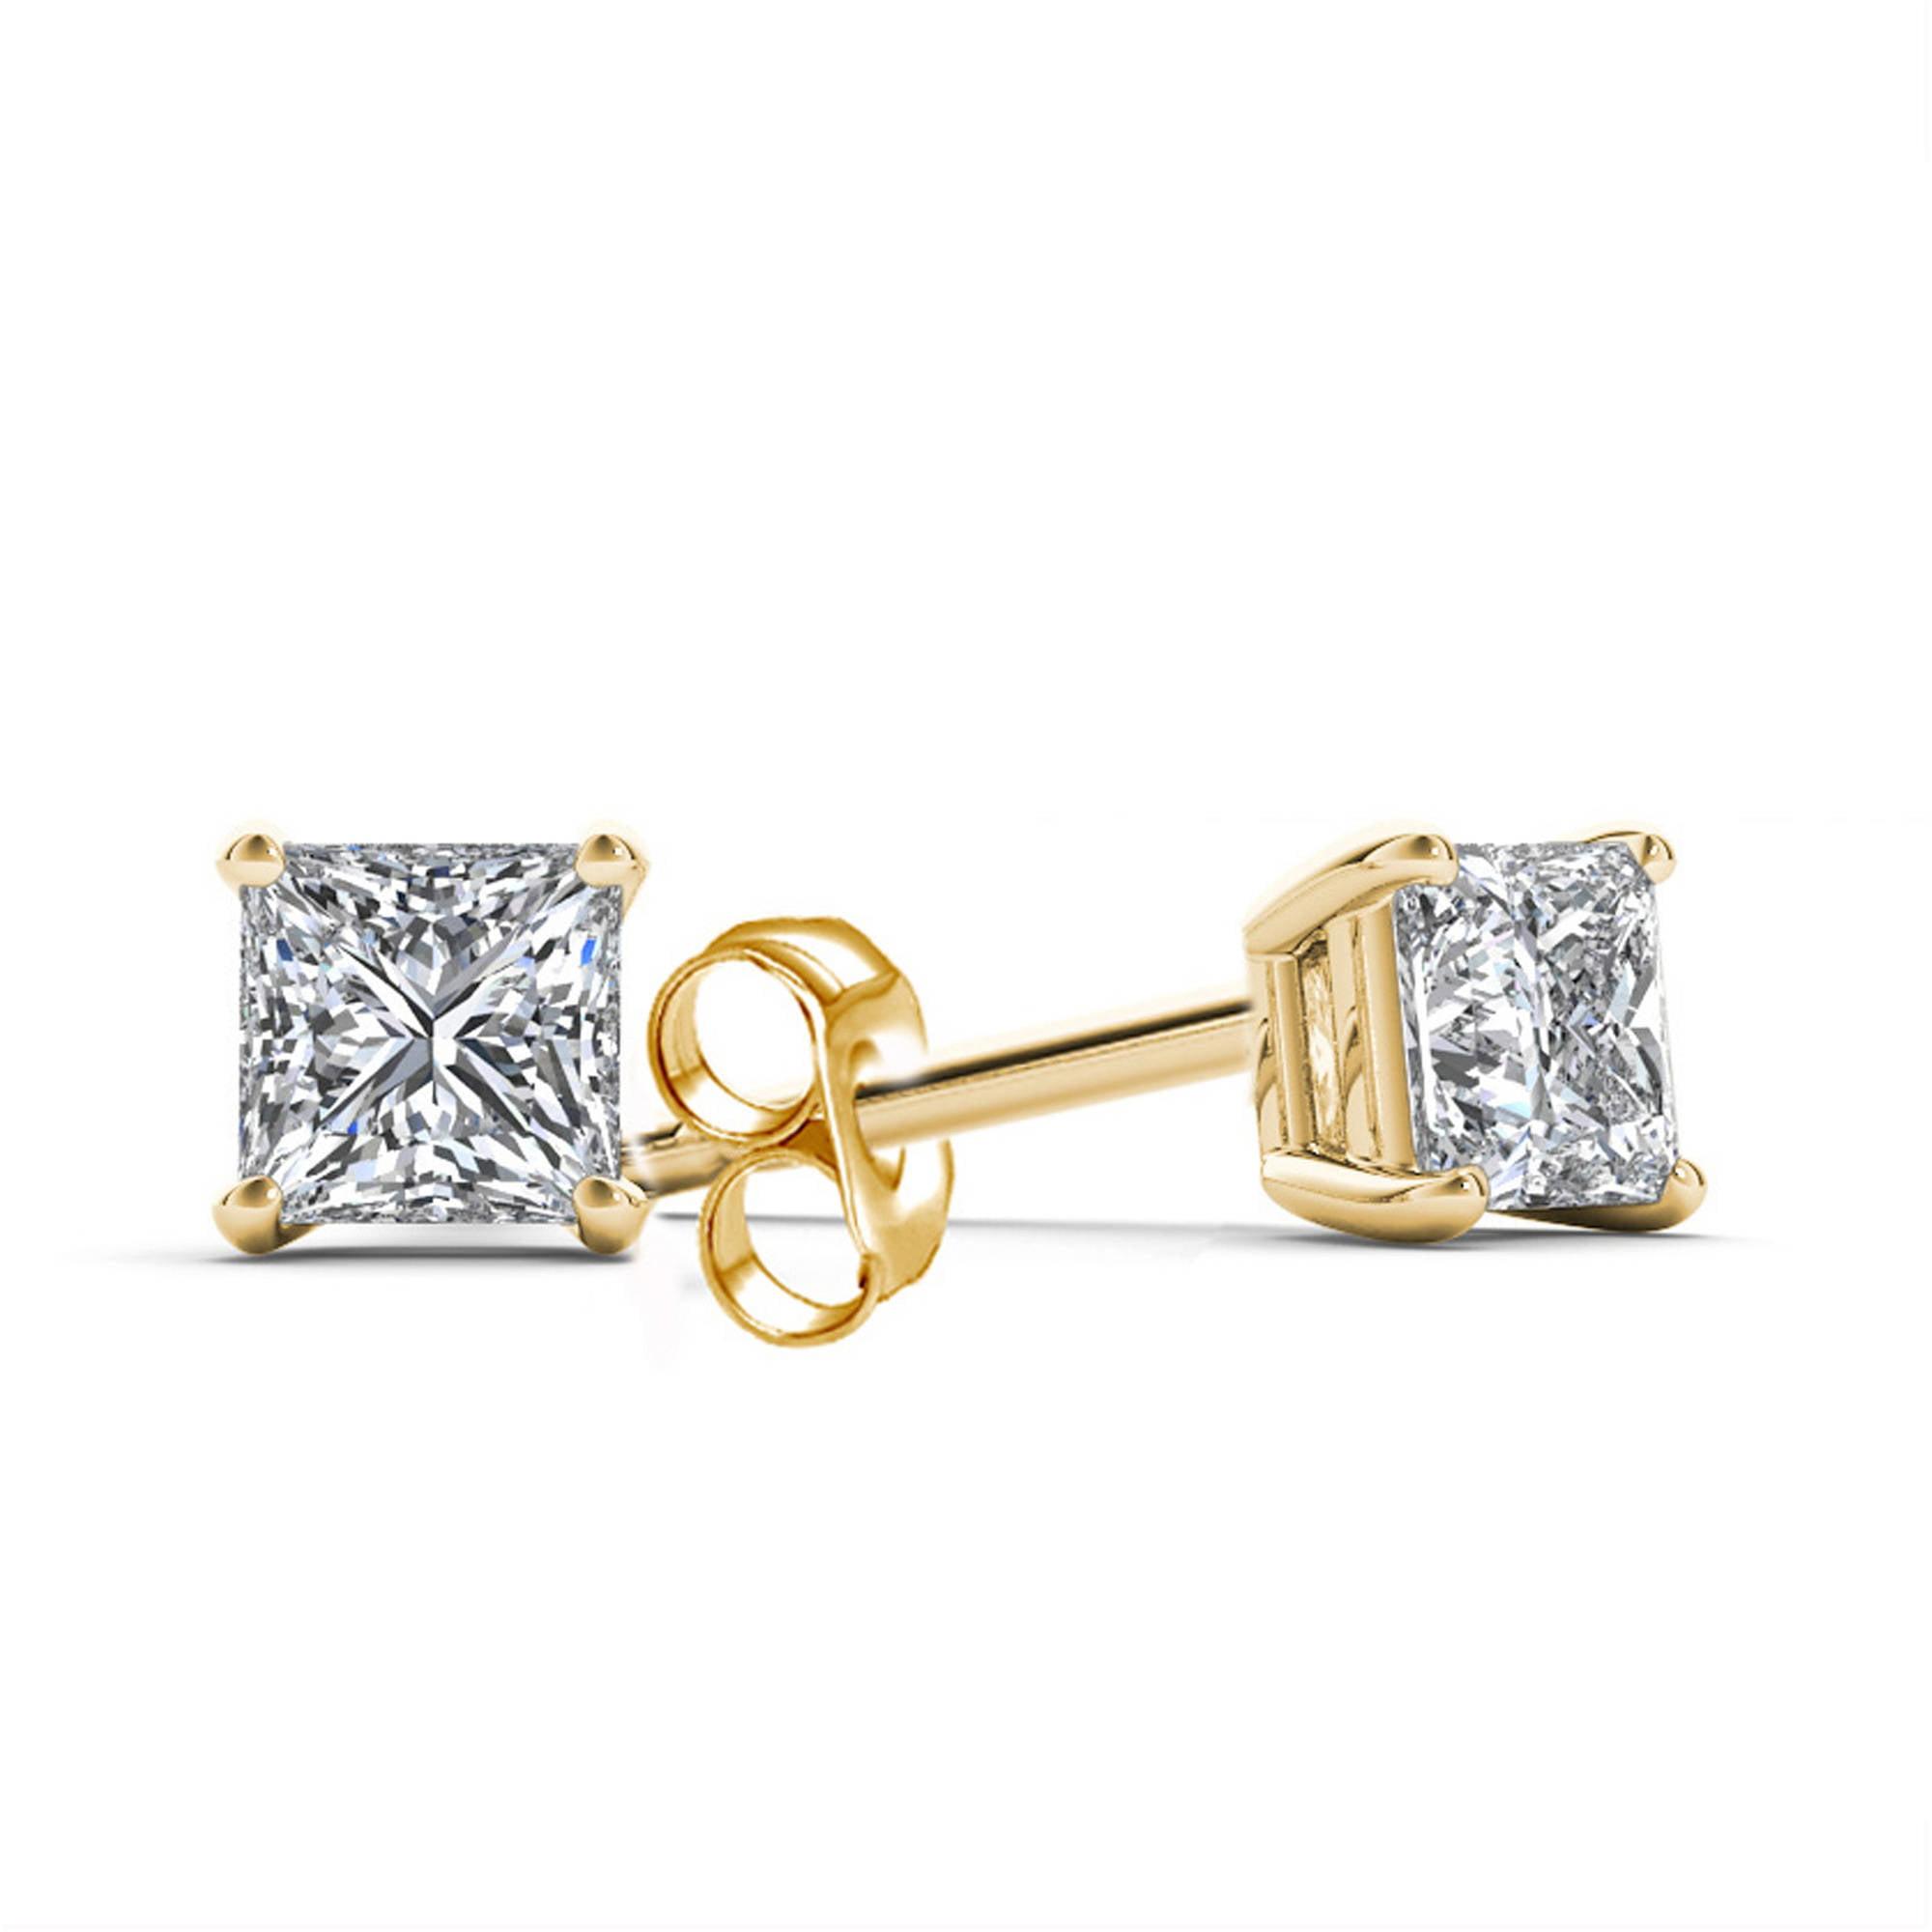 1 Carat T.W. Princess-Cut Diamond 14kt Yellow Gold Stud Earrings